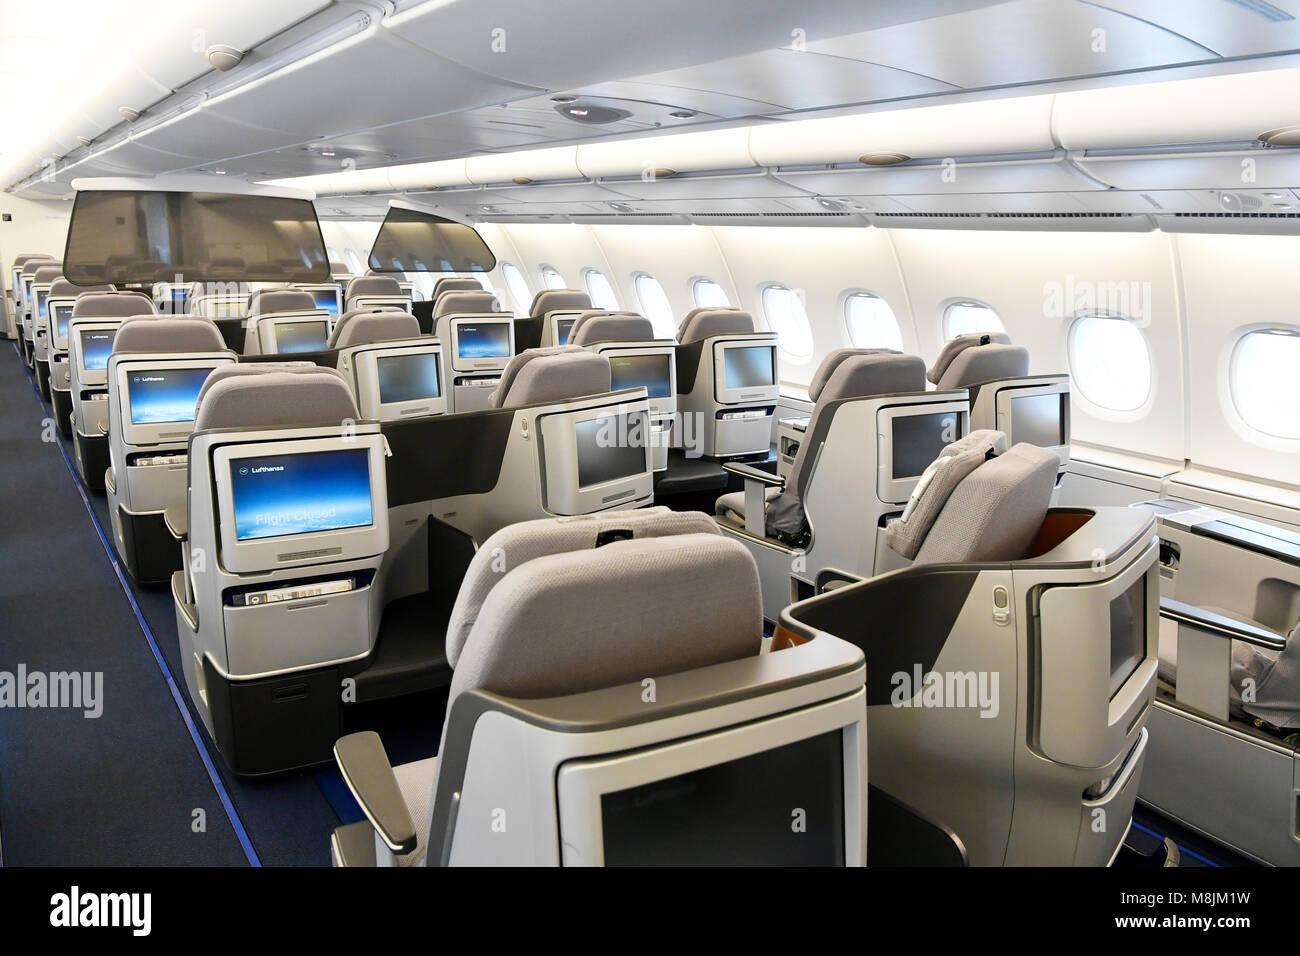 displays seats lufthansa airbus a380 800 emergency exit sleep stock photo 177431797 alamy. Black Bedroom Furniture Sets. Home Design Ideas